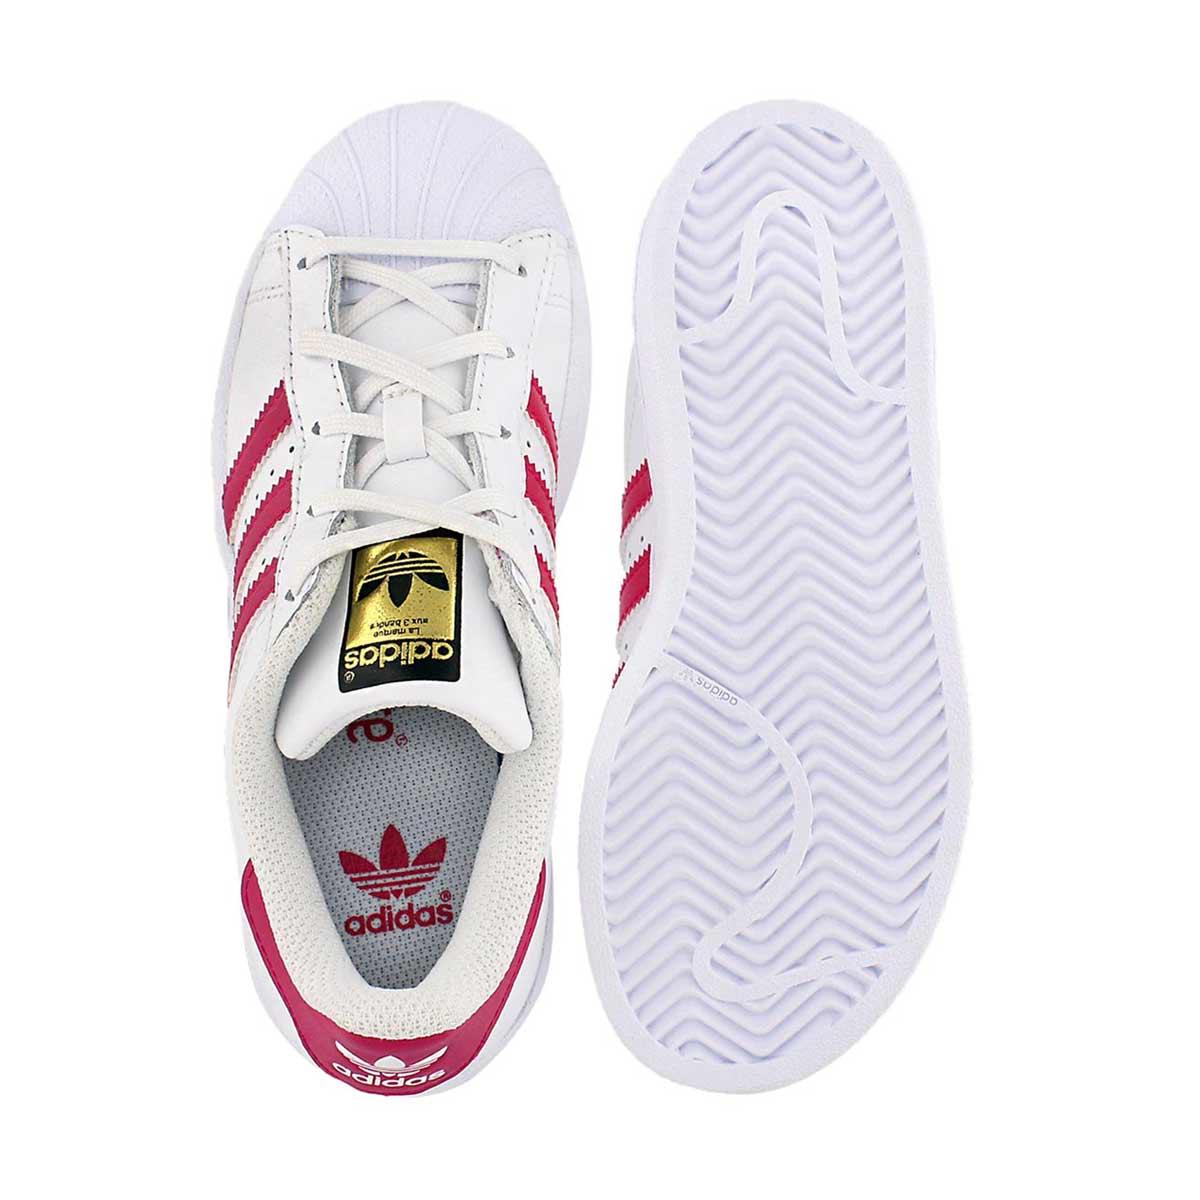 Grls Superstar wht/pnk sneaker